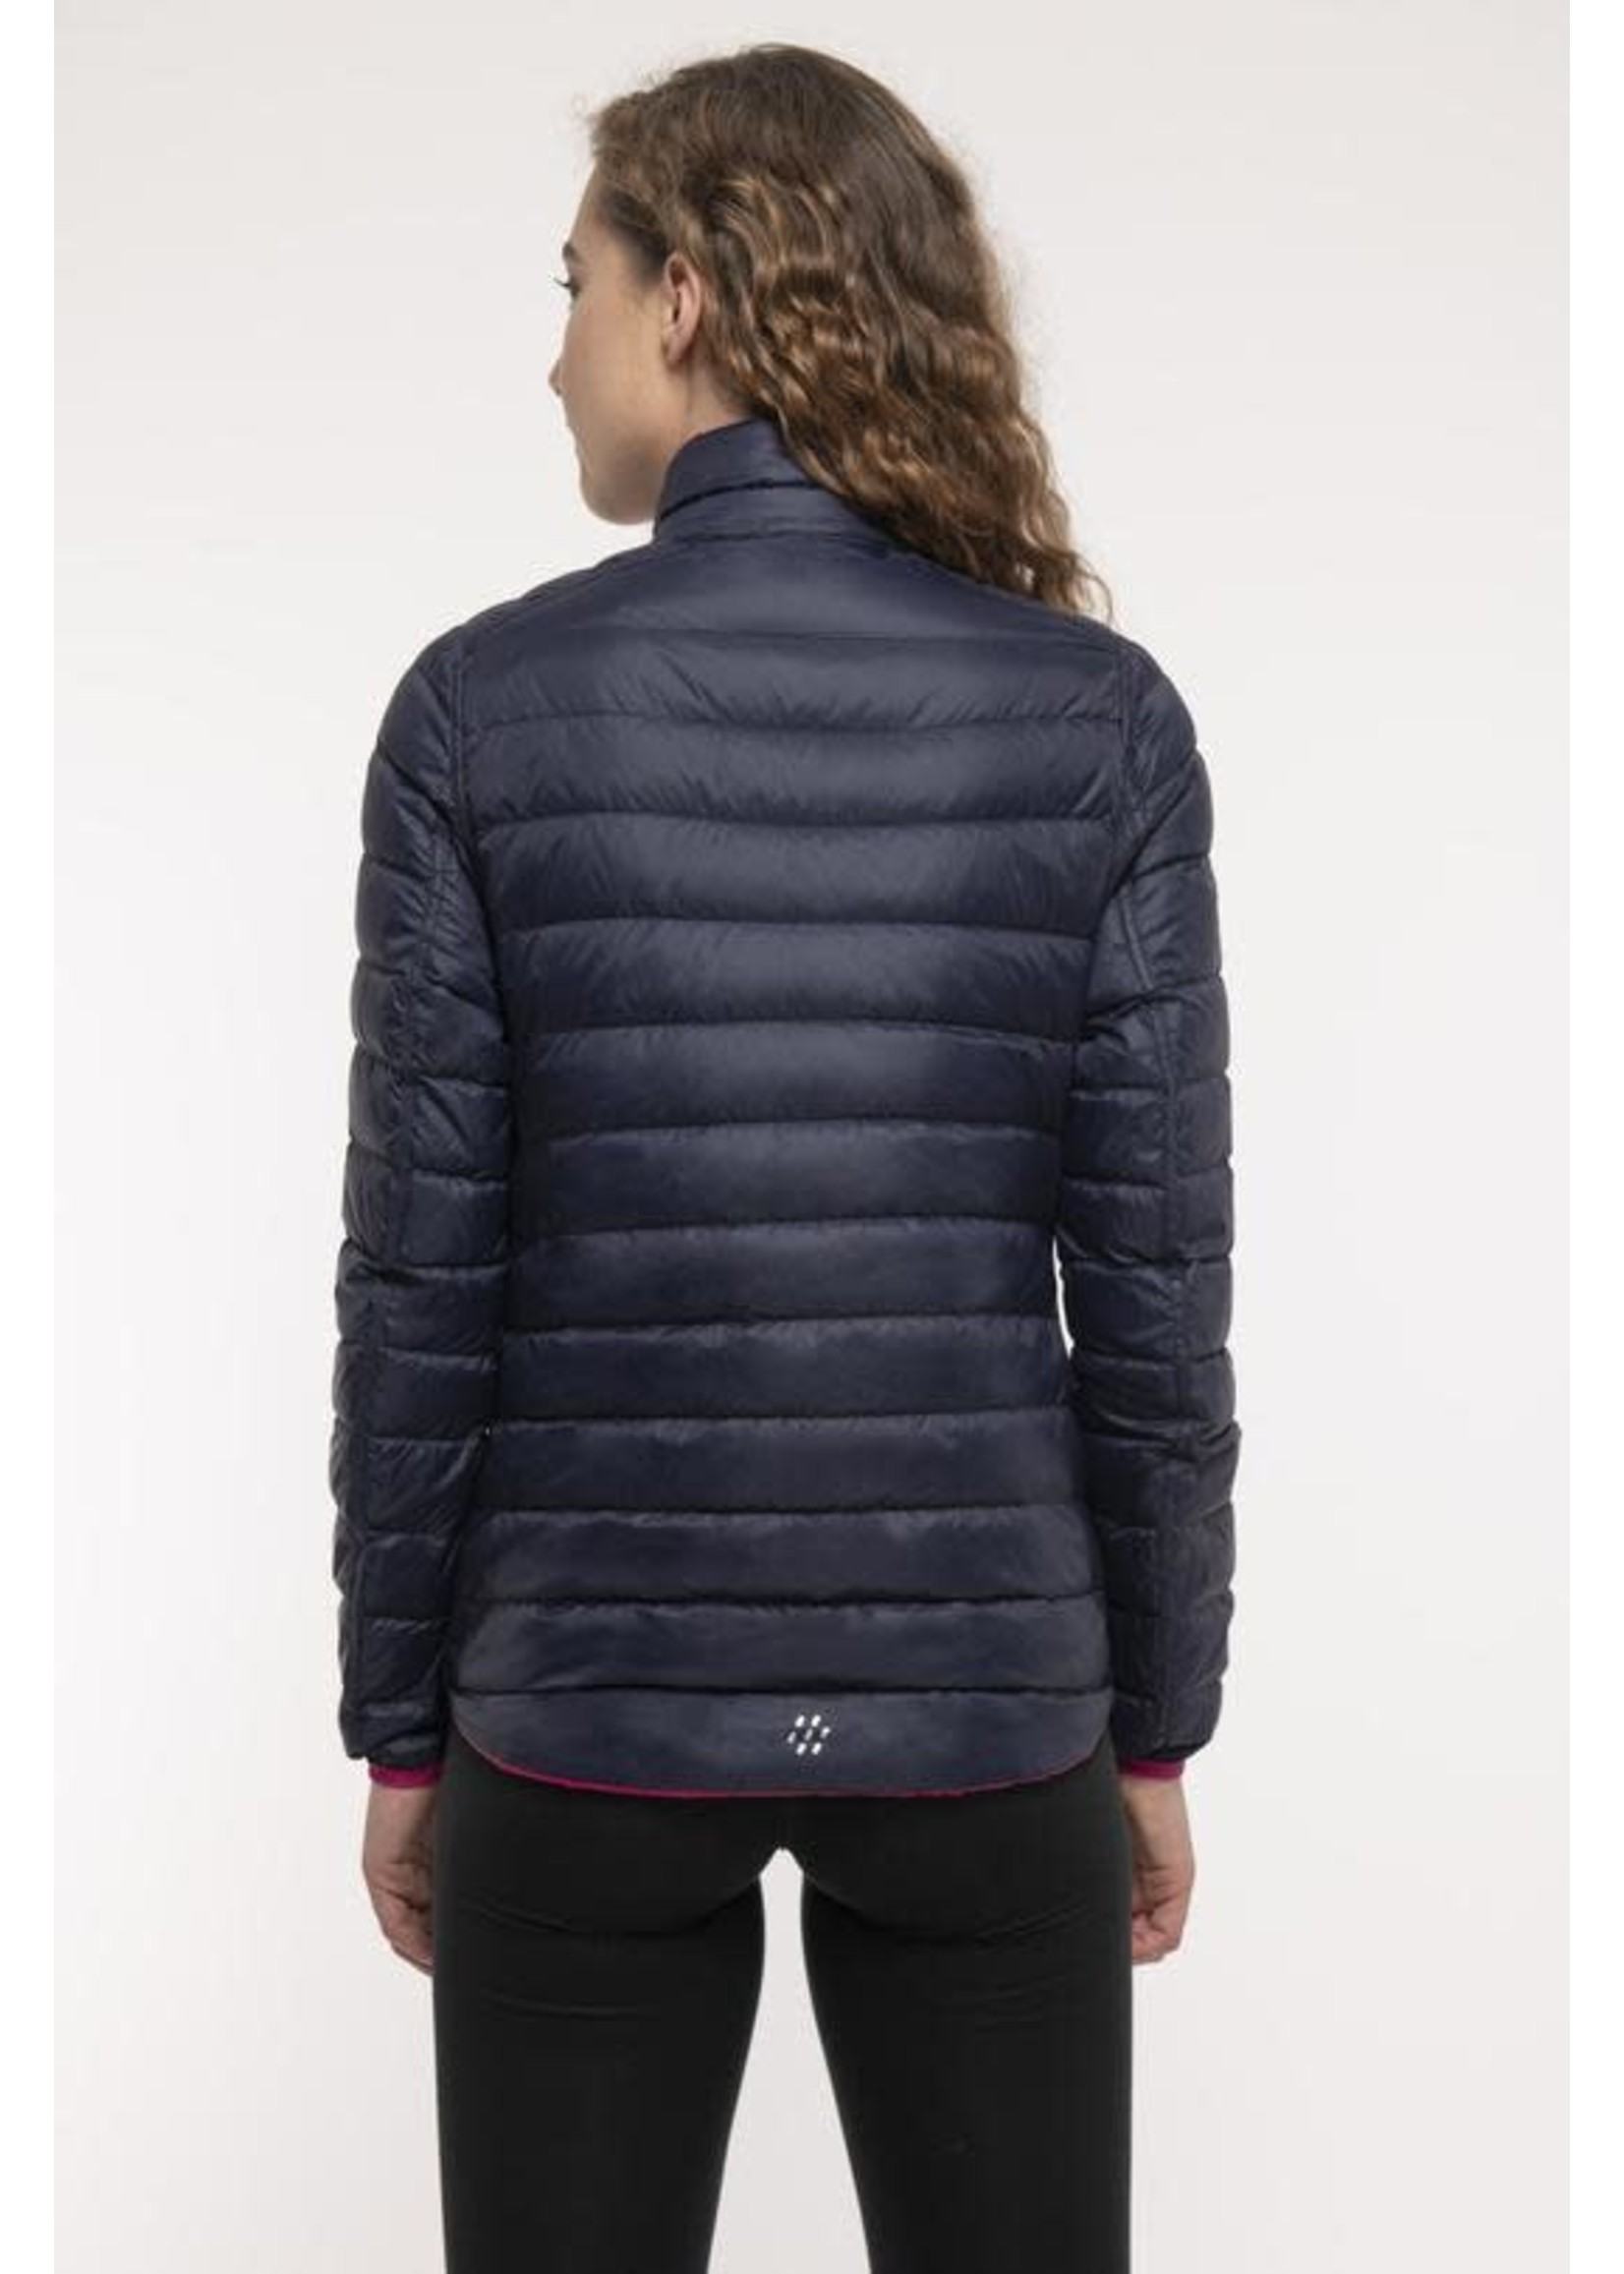 Mac In A Sac Mac in a Sac Polar Reverable Down Jacket - Ladies (2021)